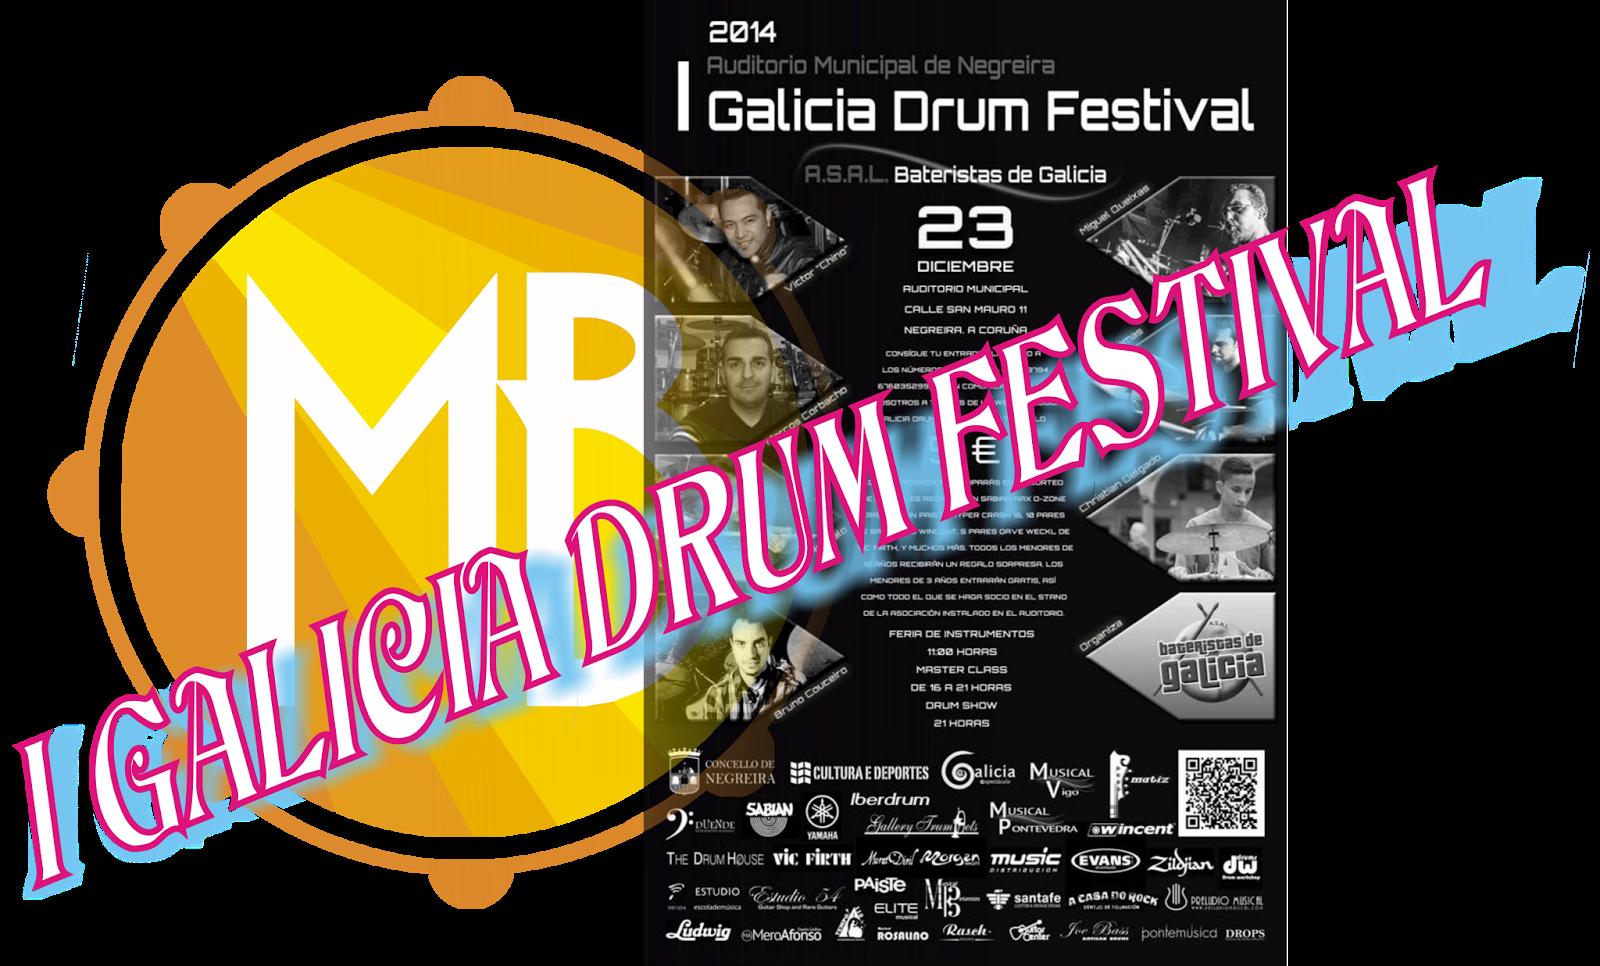 portada reseña blog massbateria galicia drum festival